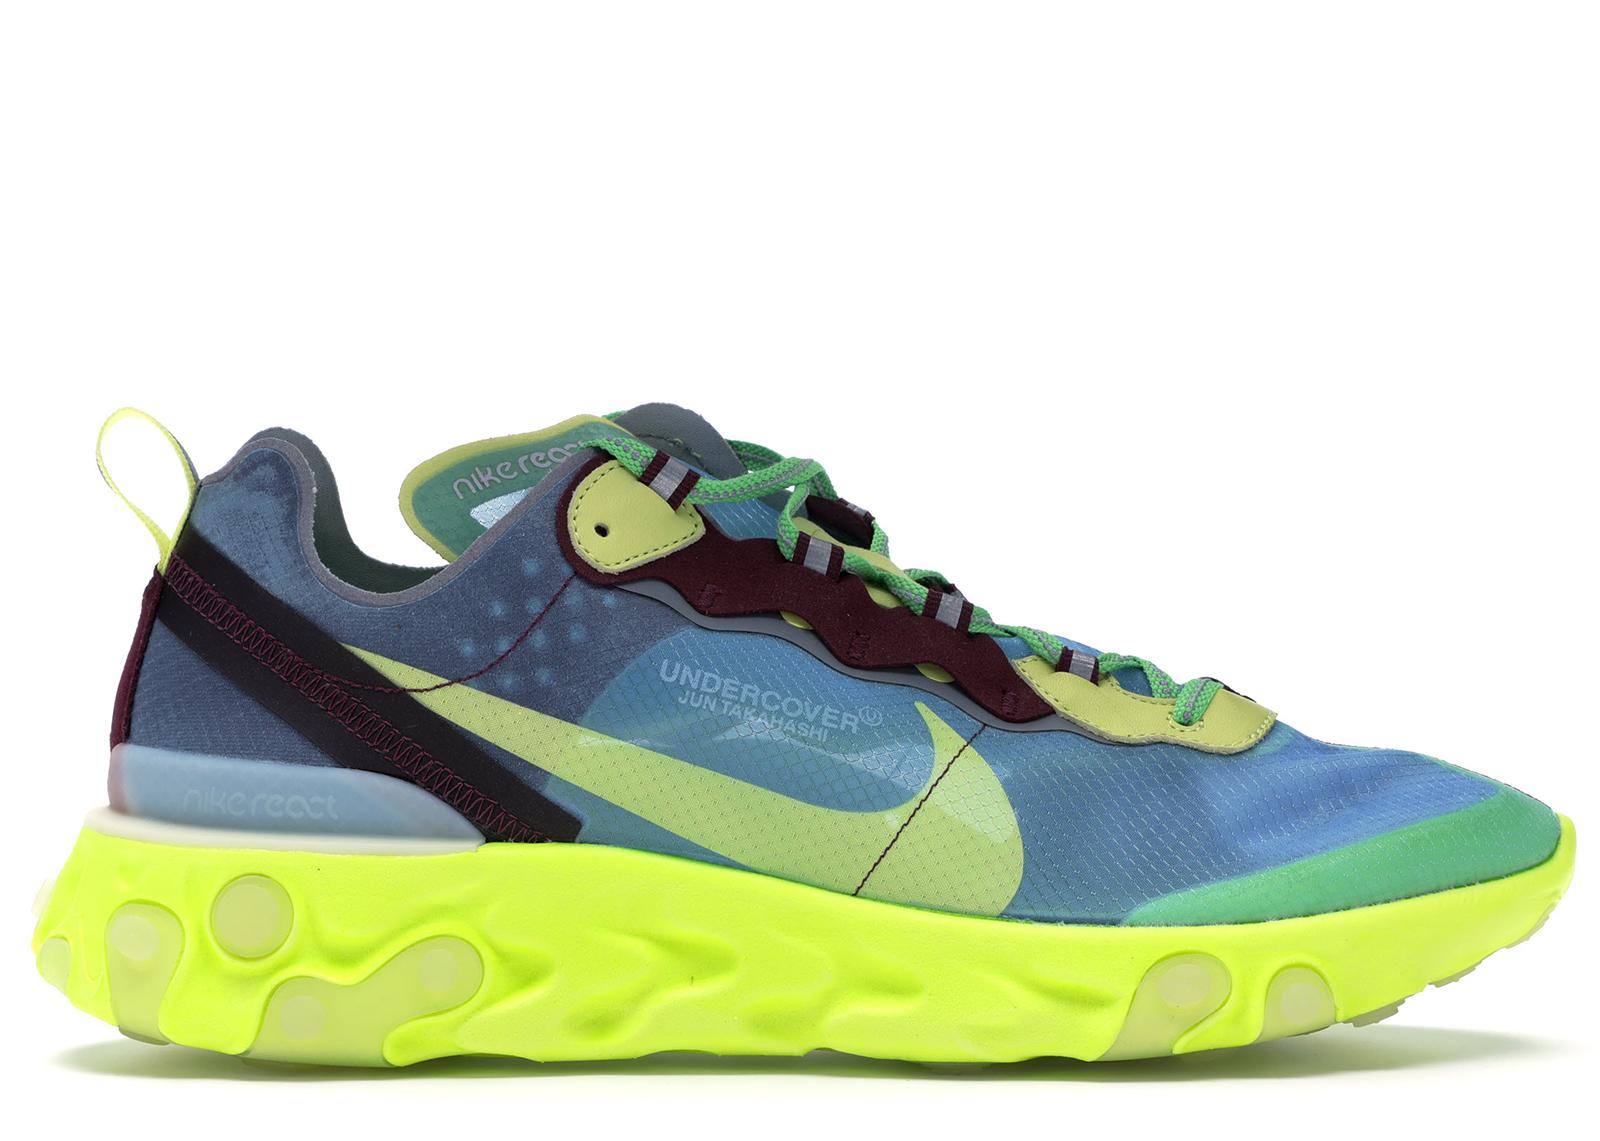 Nike React Element 87 Undercover Lakeside